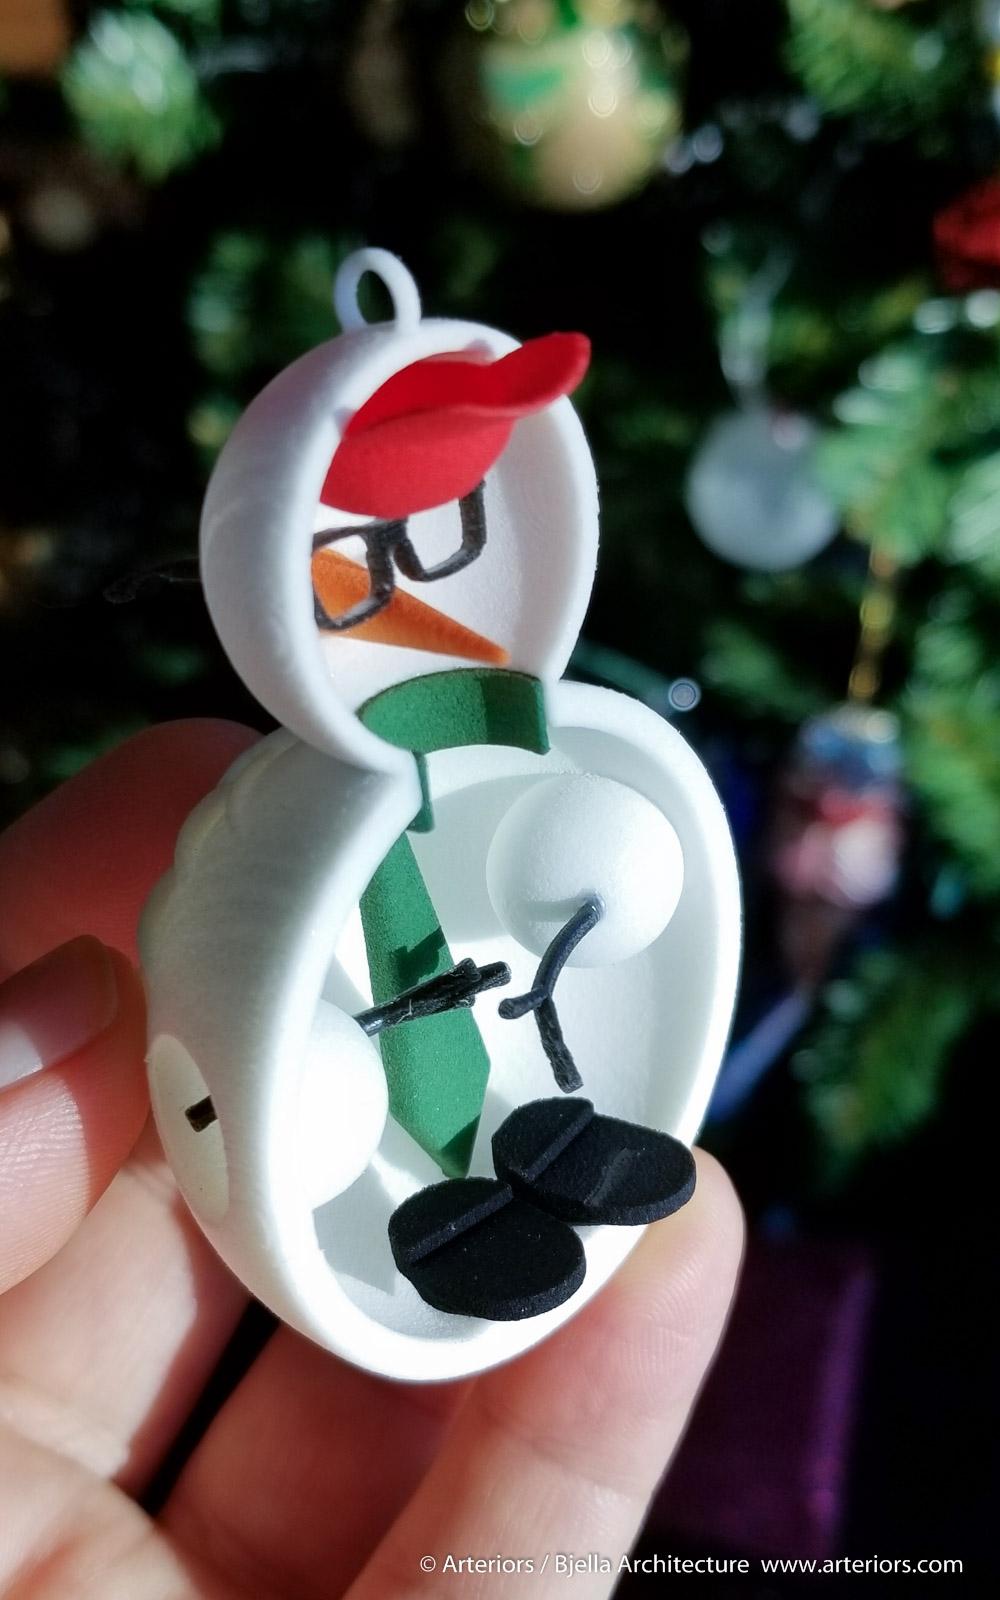 Snowman Ornament 1 - 3d printed - by Tim Bjella-4